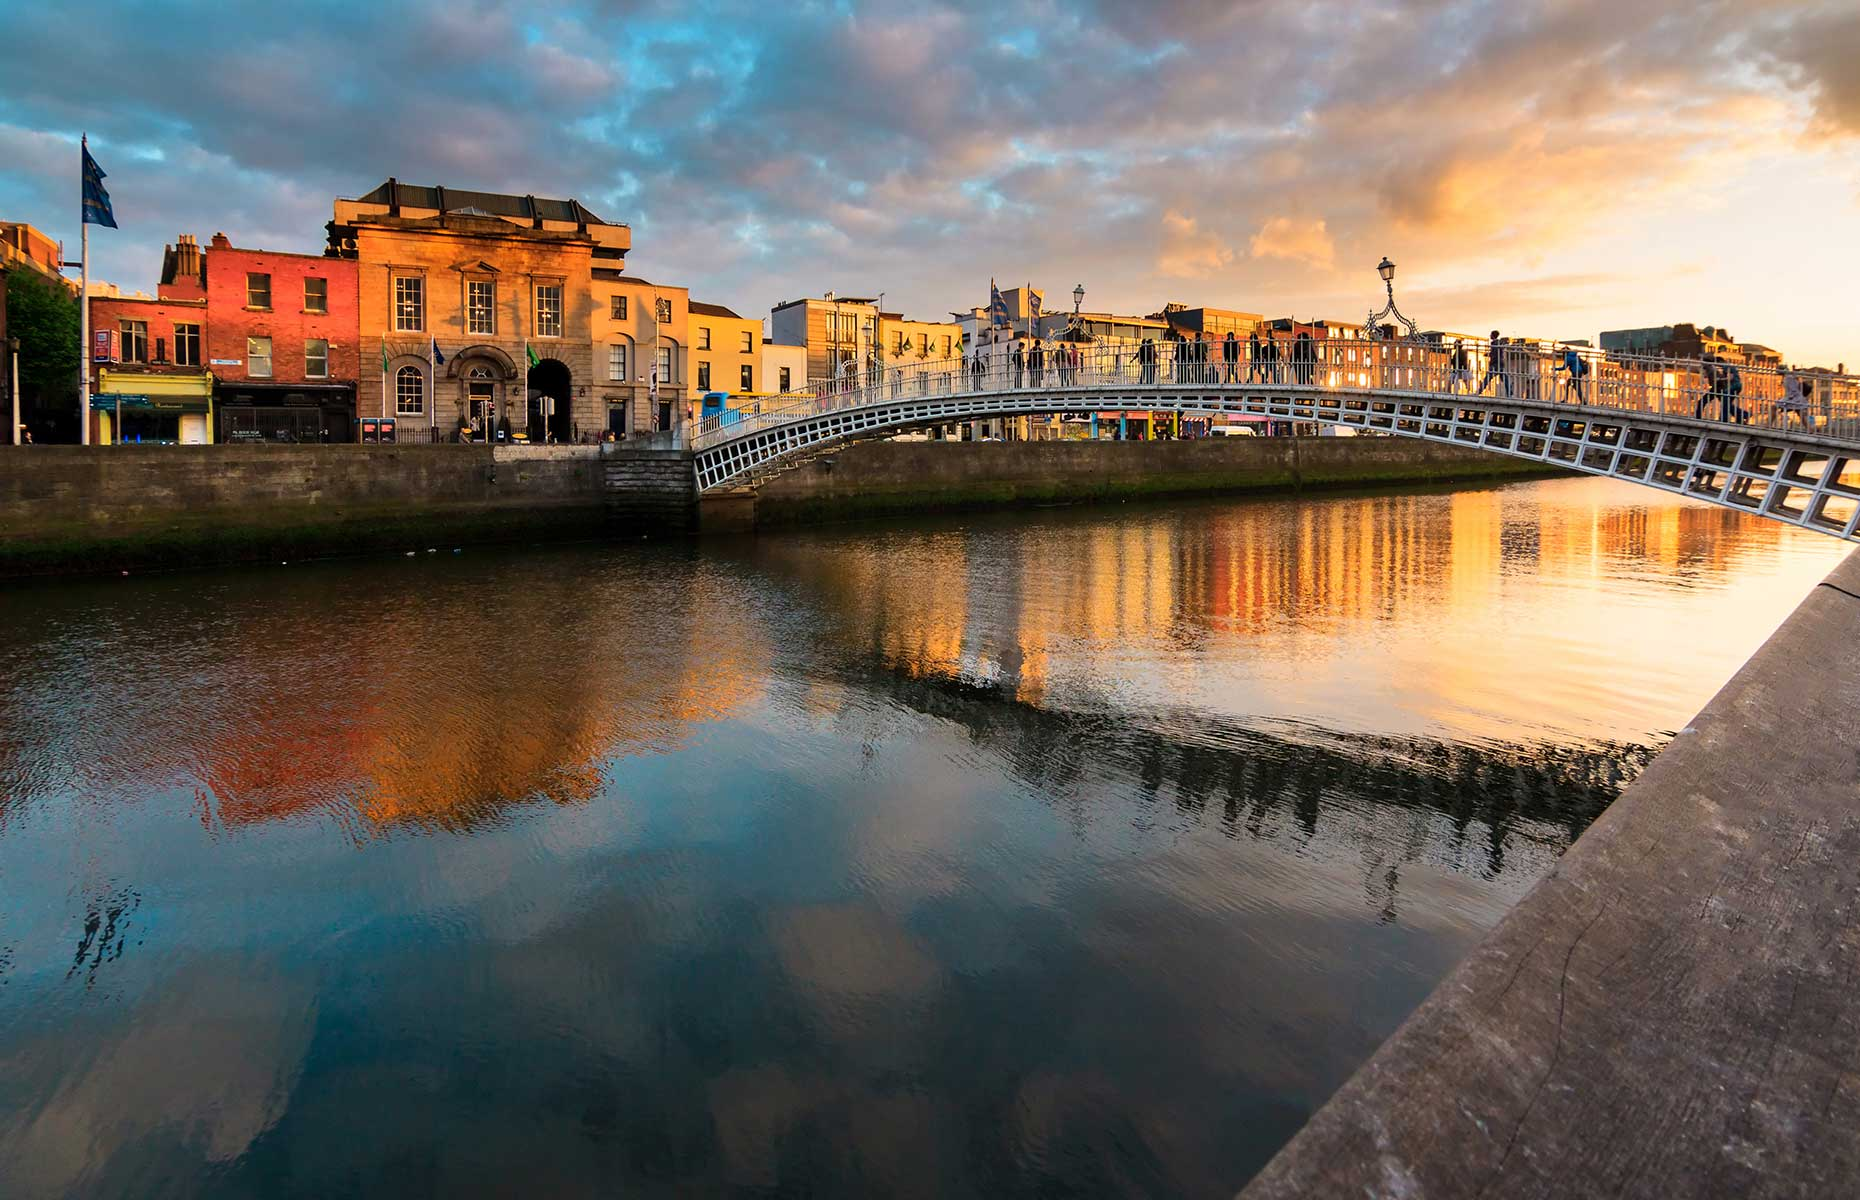 Dublin, Ireland (Image: POM POM/Shutterstock)